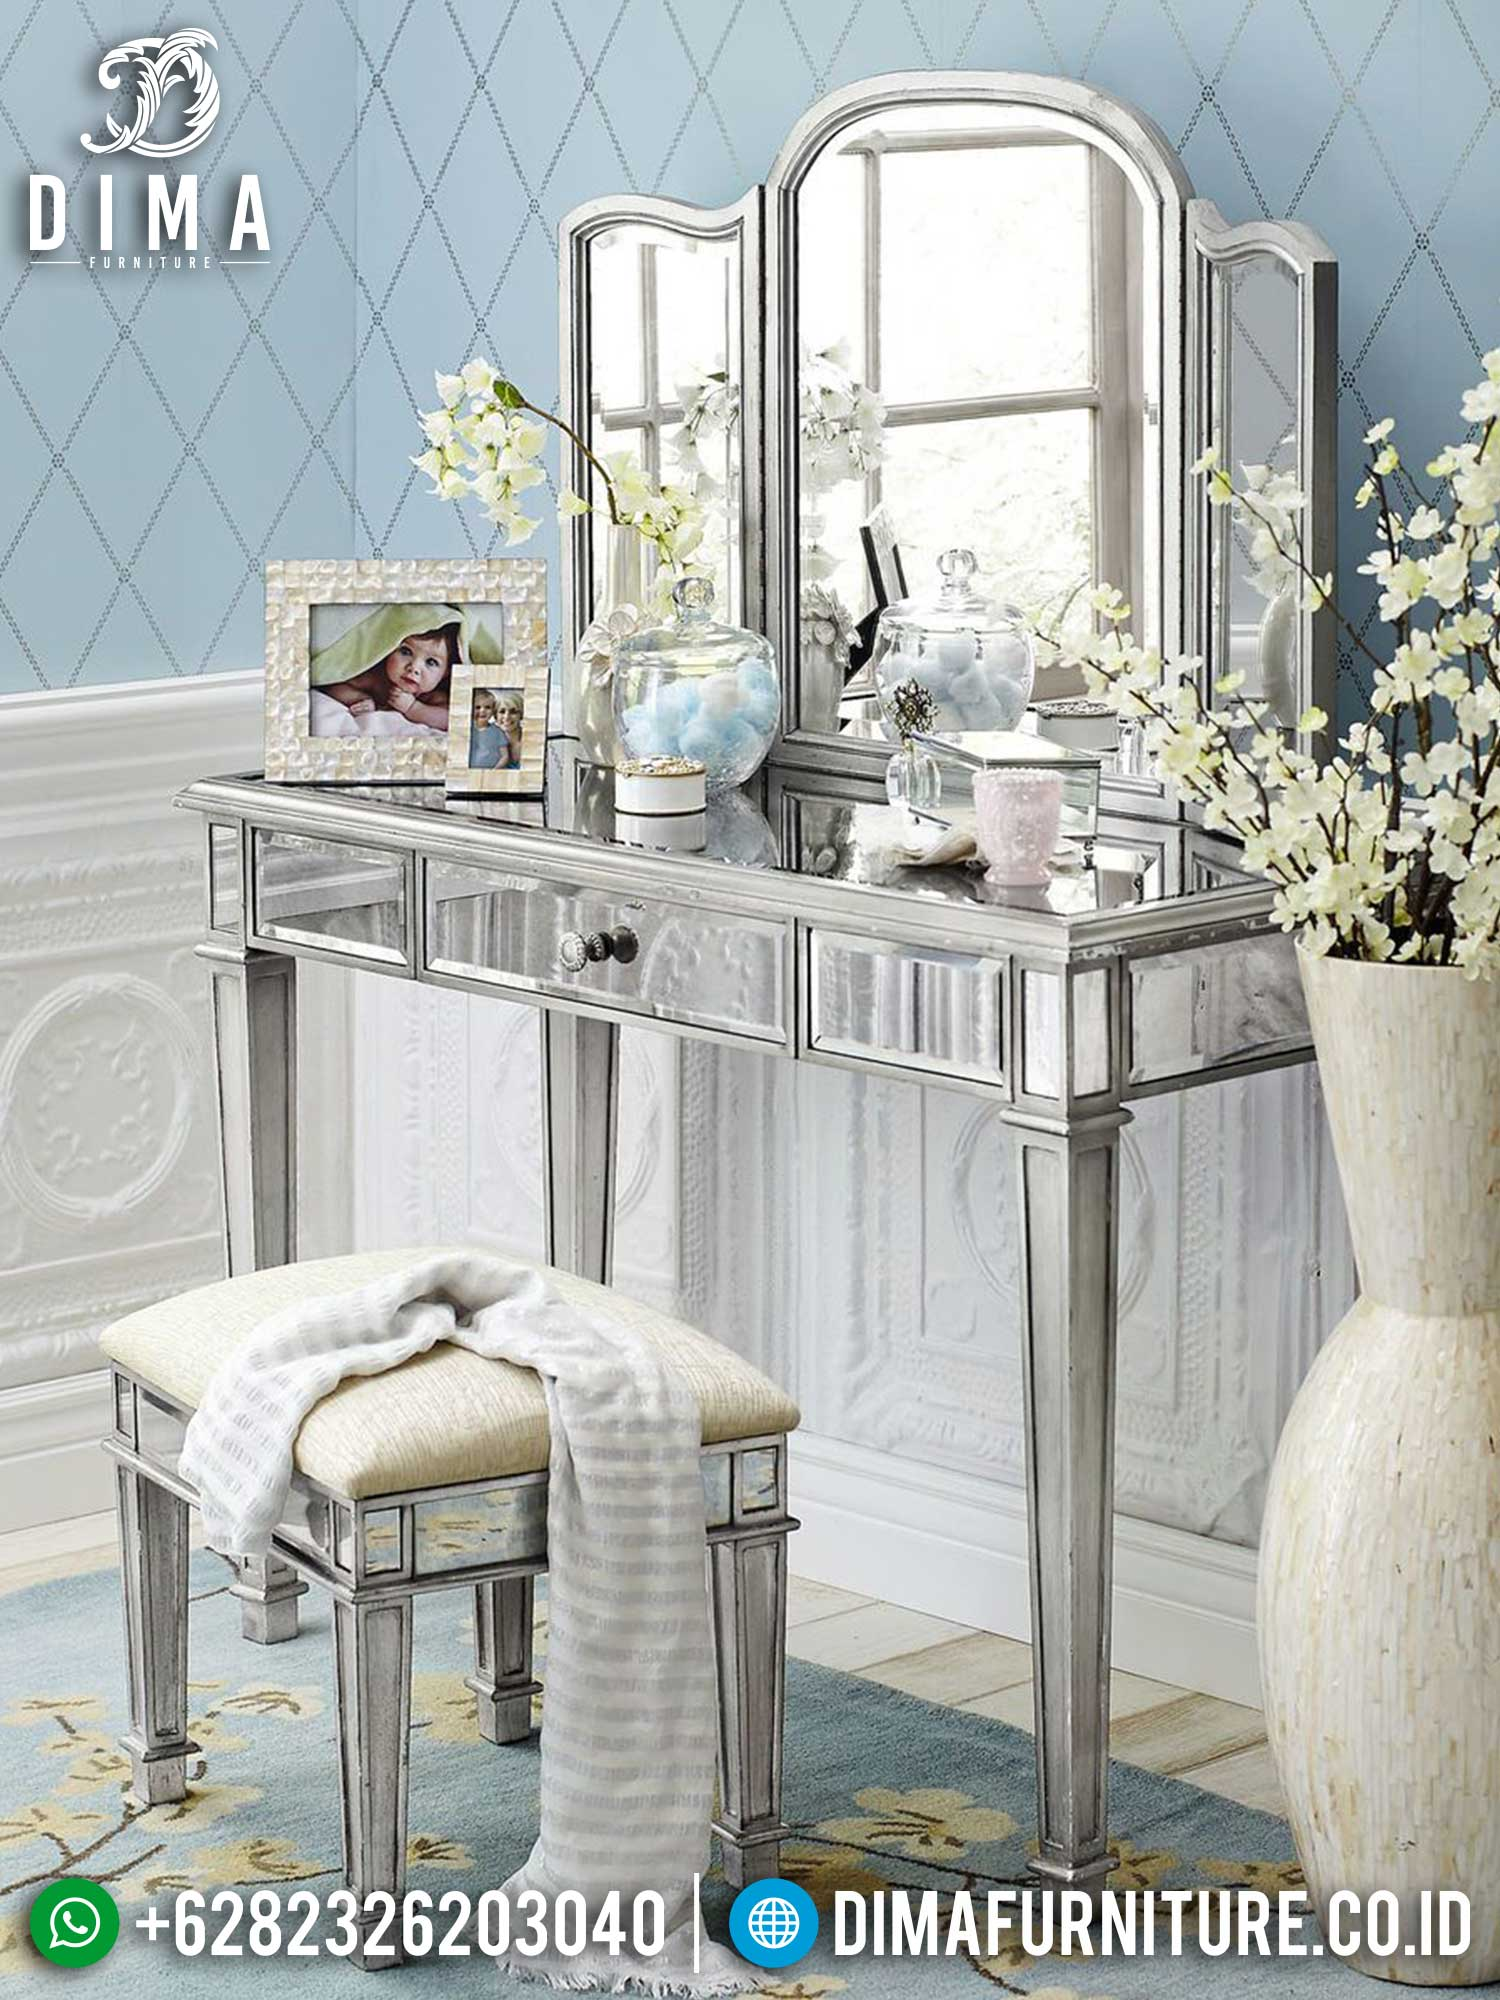 Meja Rias Minimalis Mewah Full Glass Luxury Simple Design Furniture Jepara TTJ-1432